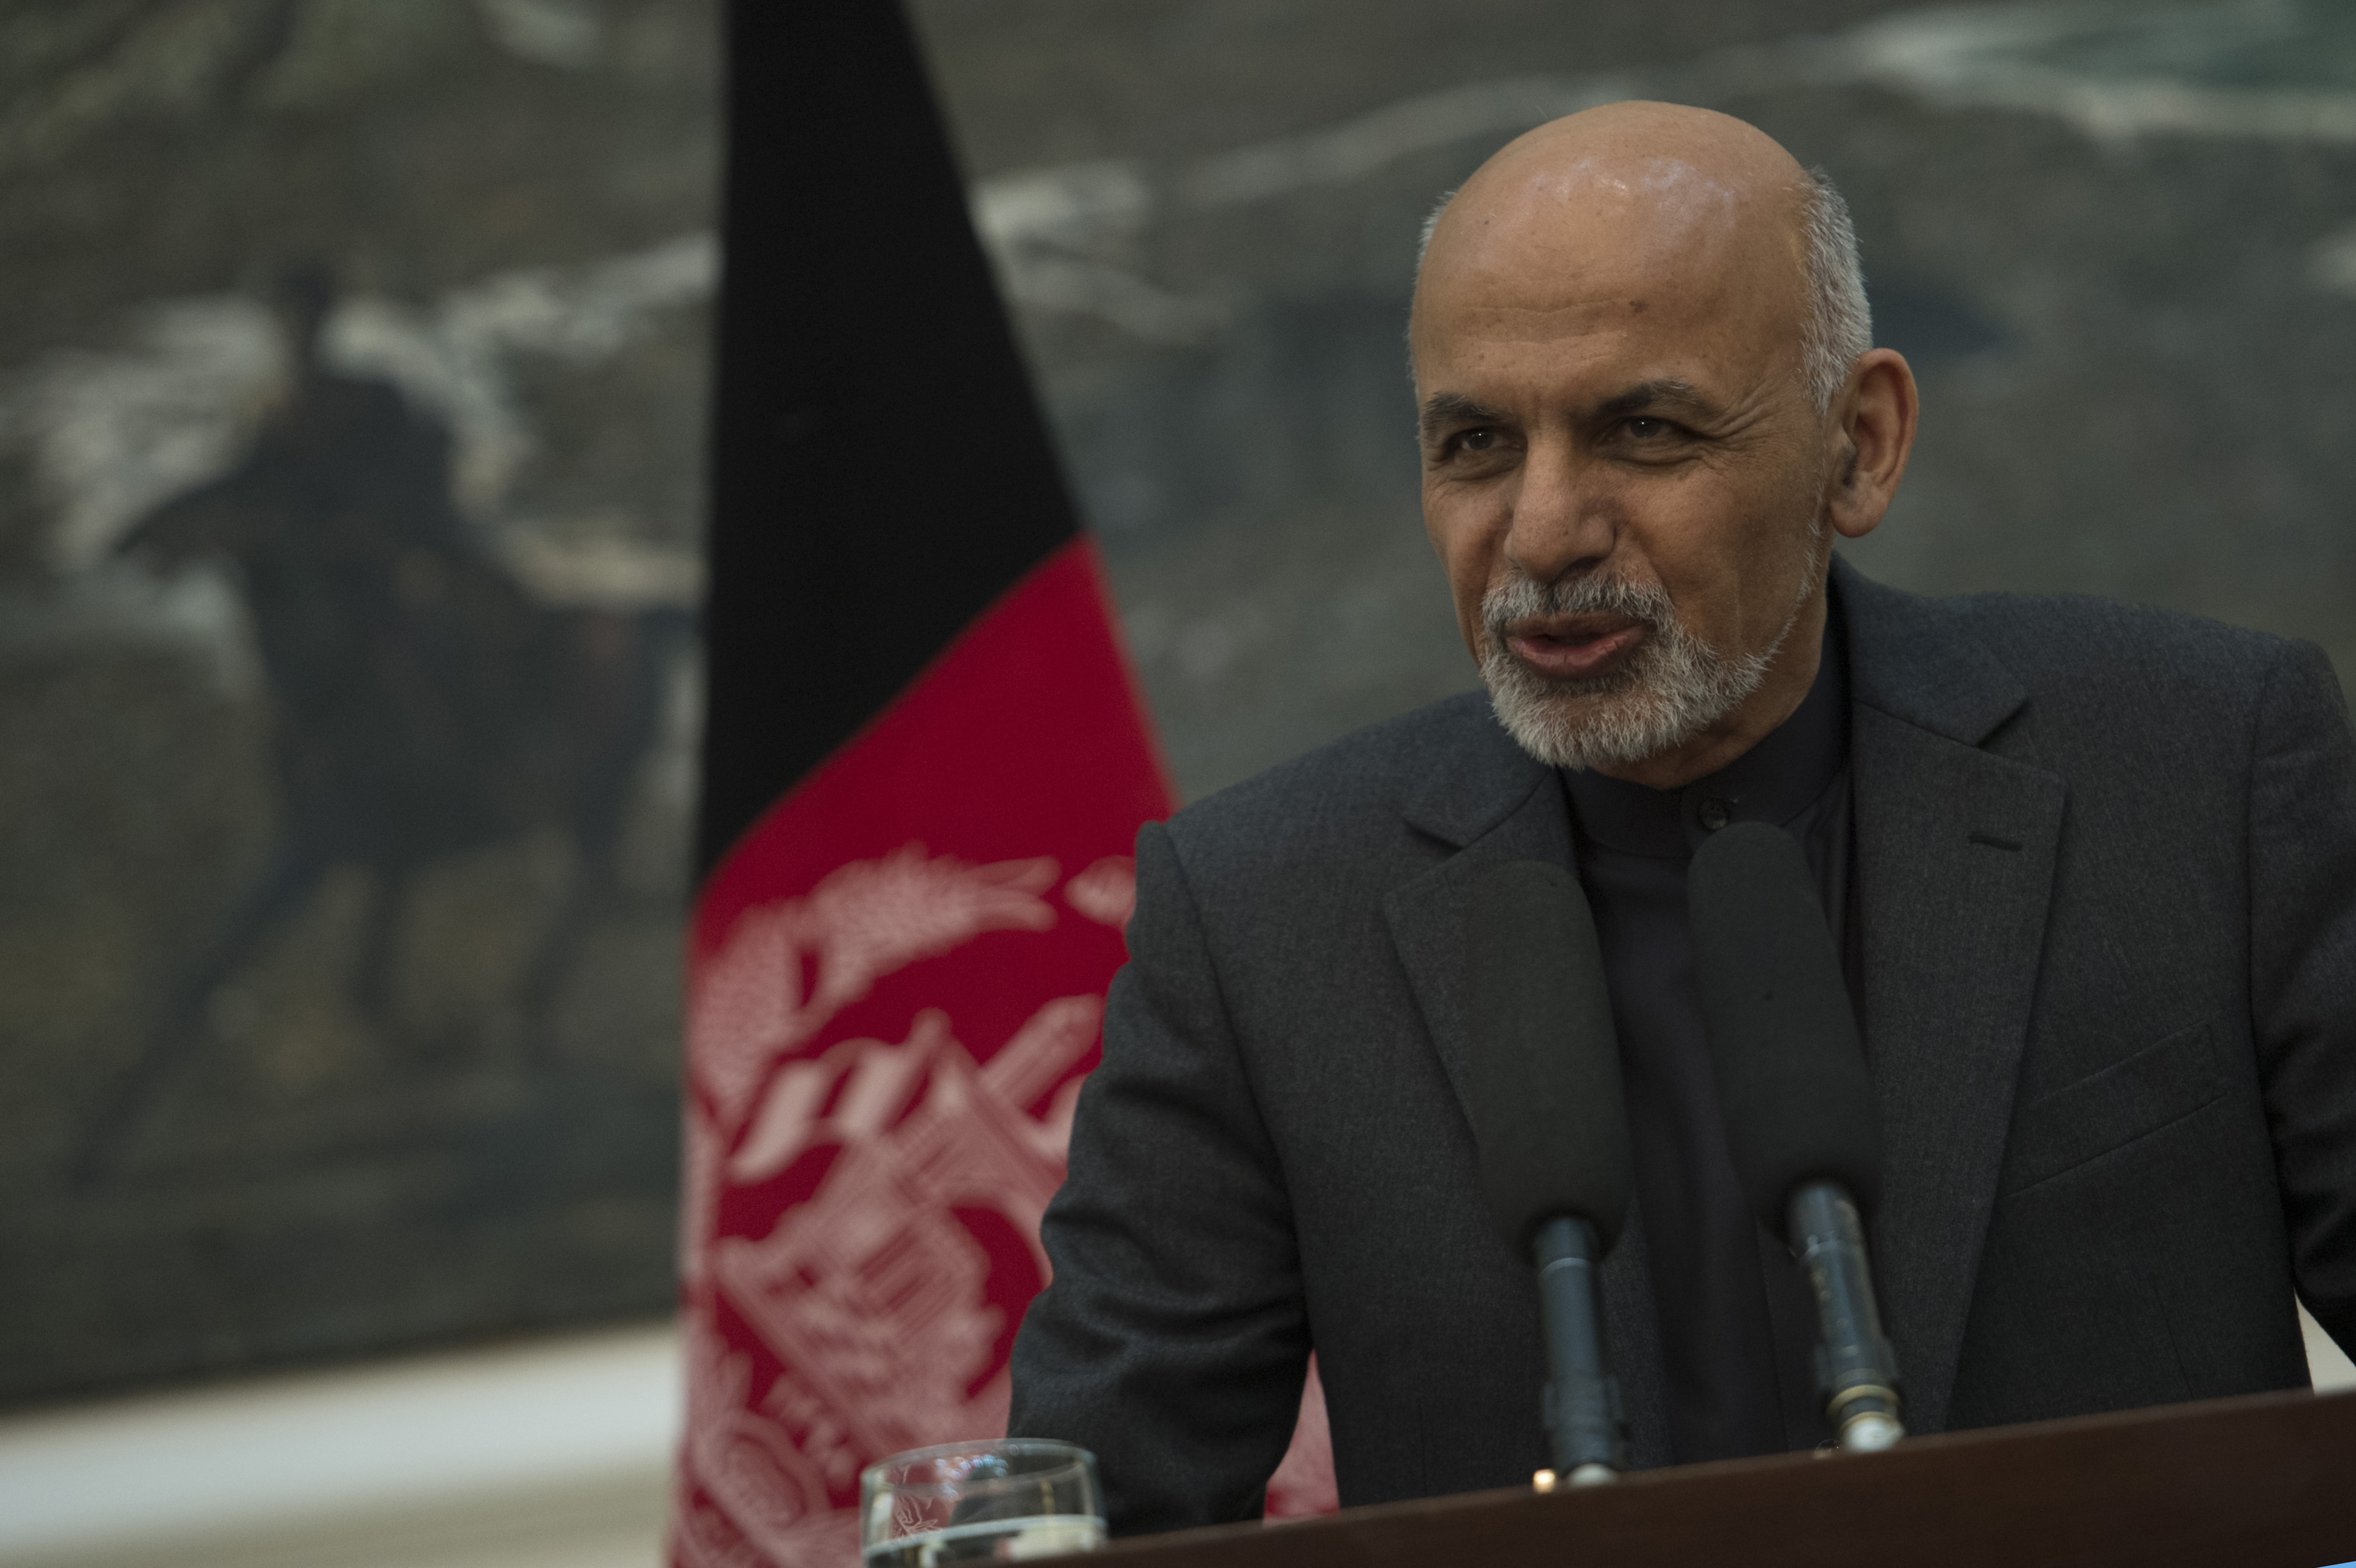 Afghan President Ashraf Ghani speaks during a press